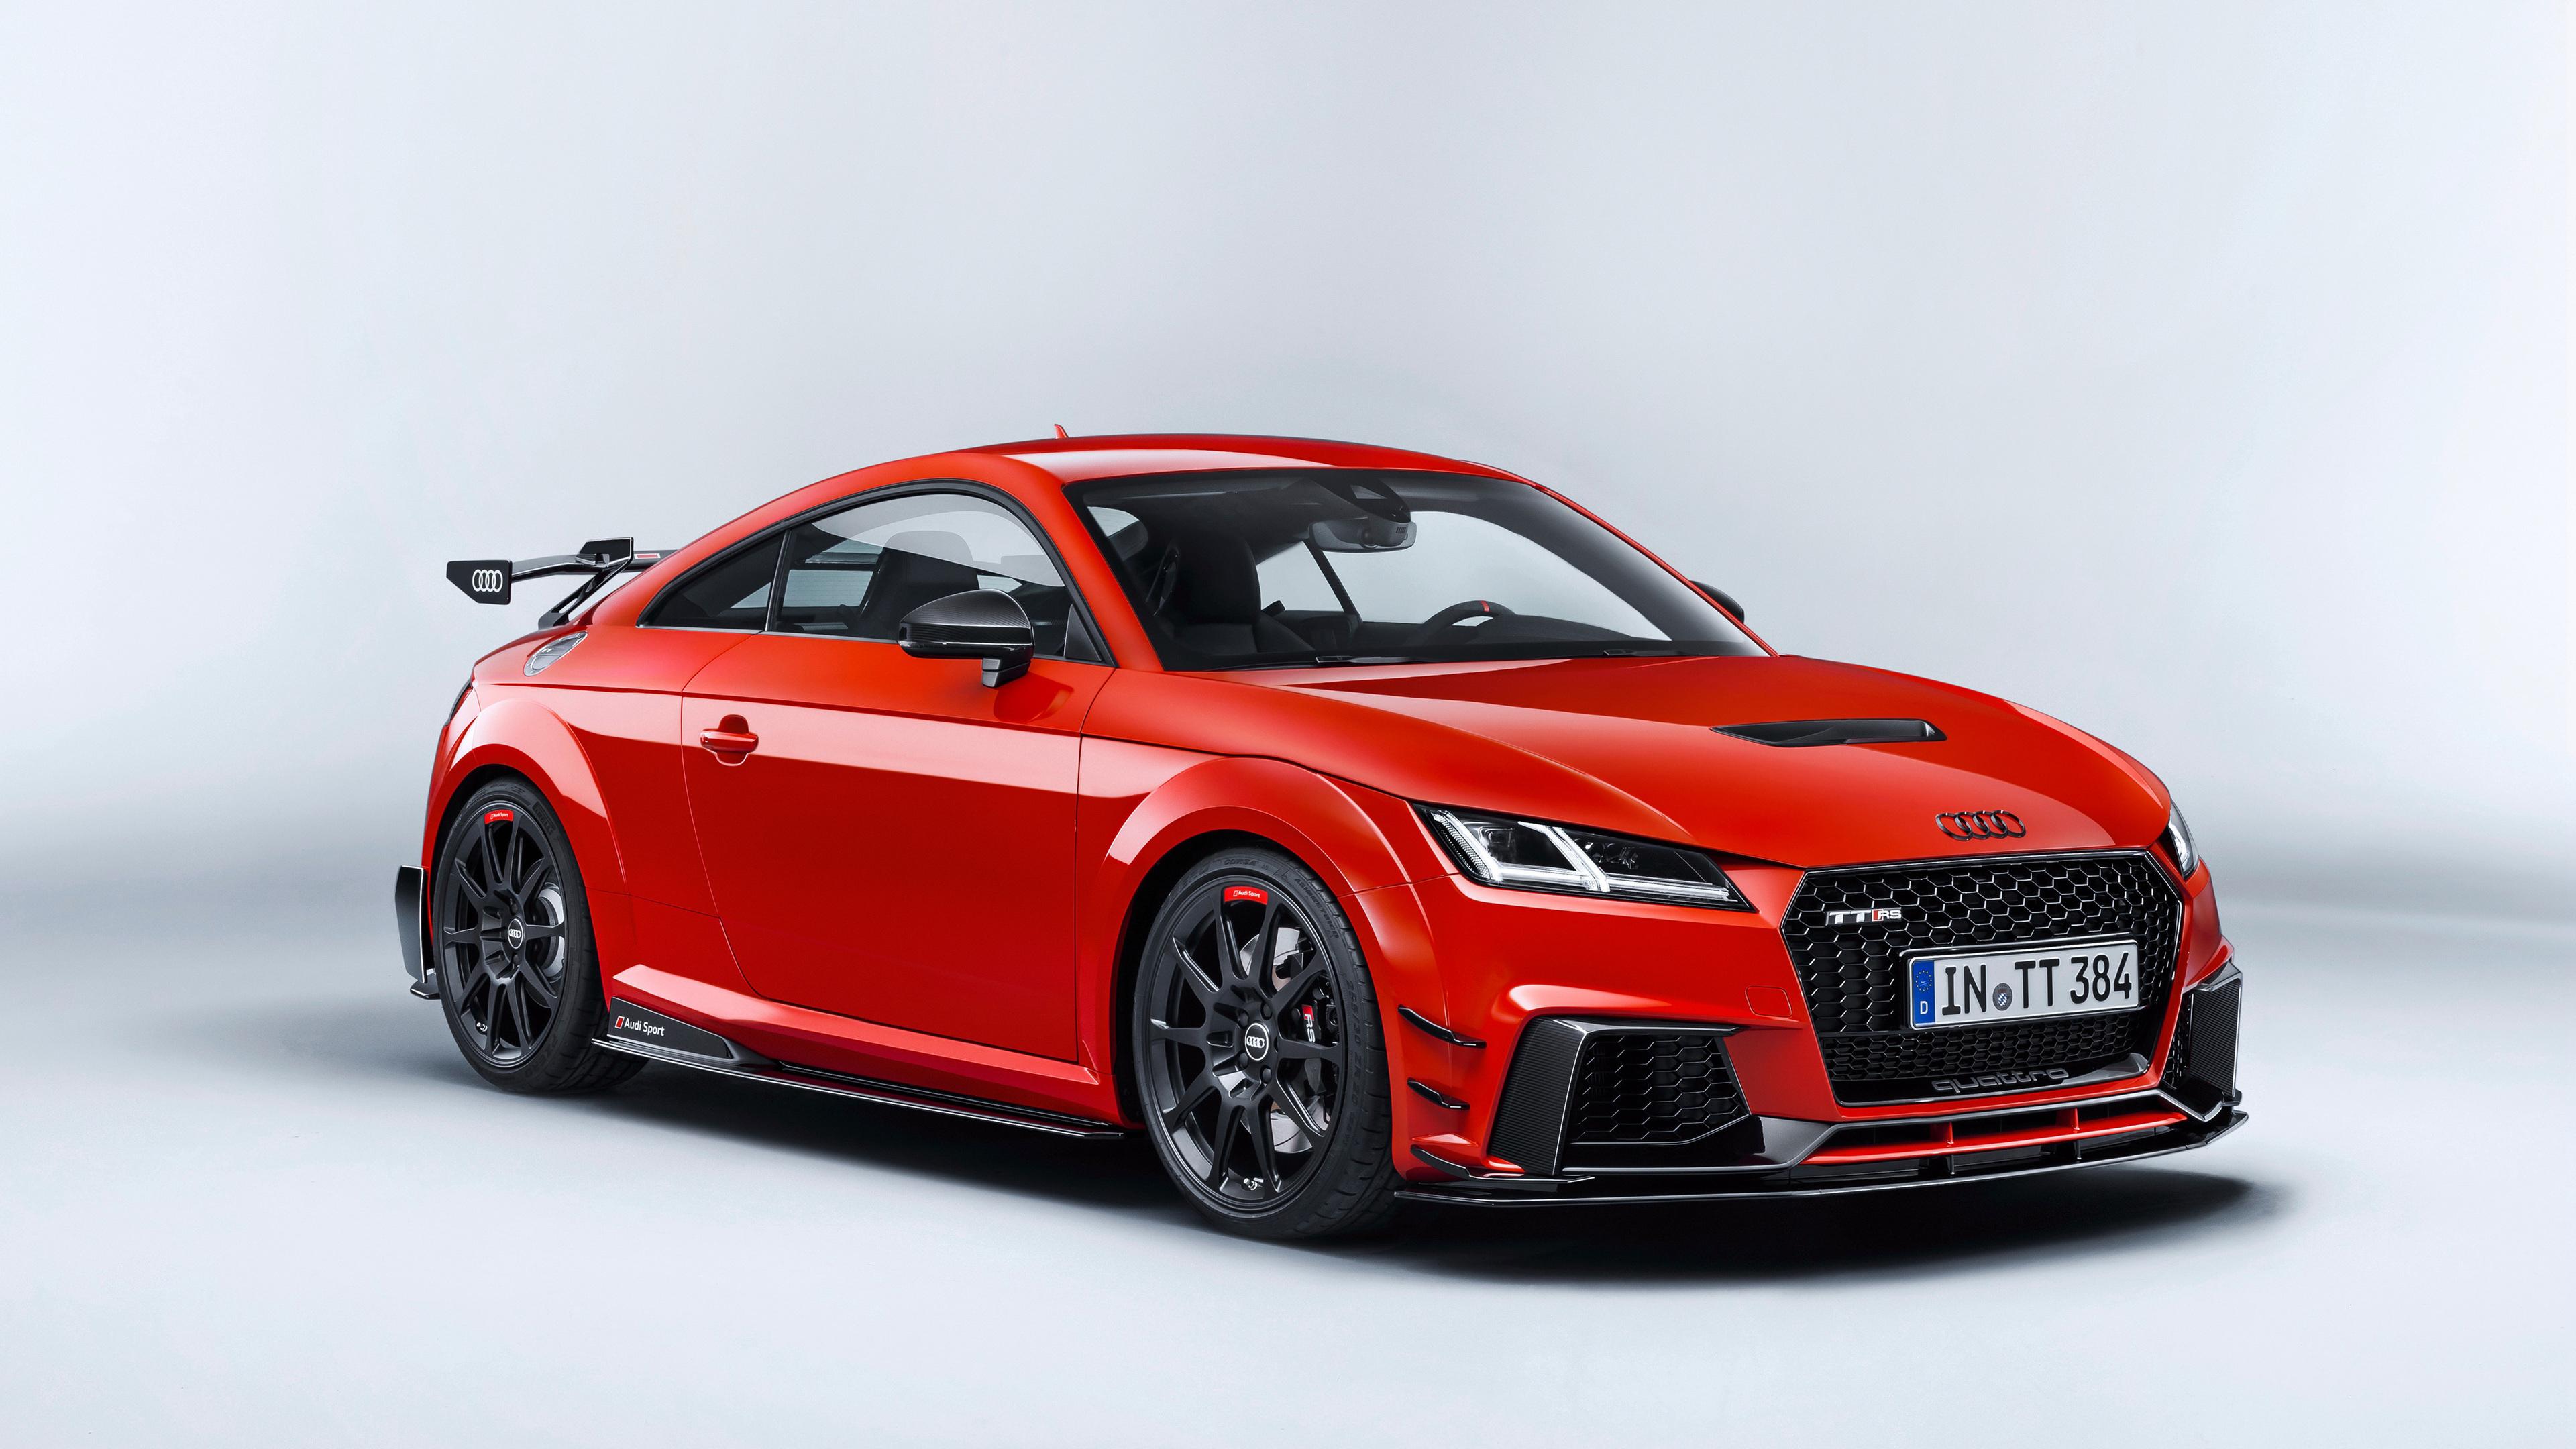 audi tt rs performance parts 1539105875 - Audi TT RS Performance Parts - hd-wallpapers, cars wallpapers, audi wallpapers, audi tt wallpapers, 4k-wallpapers, 2017 cars wallpapers